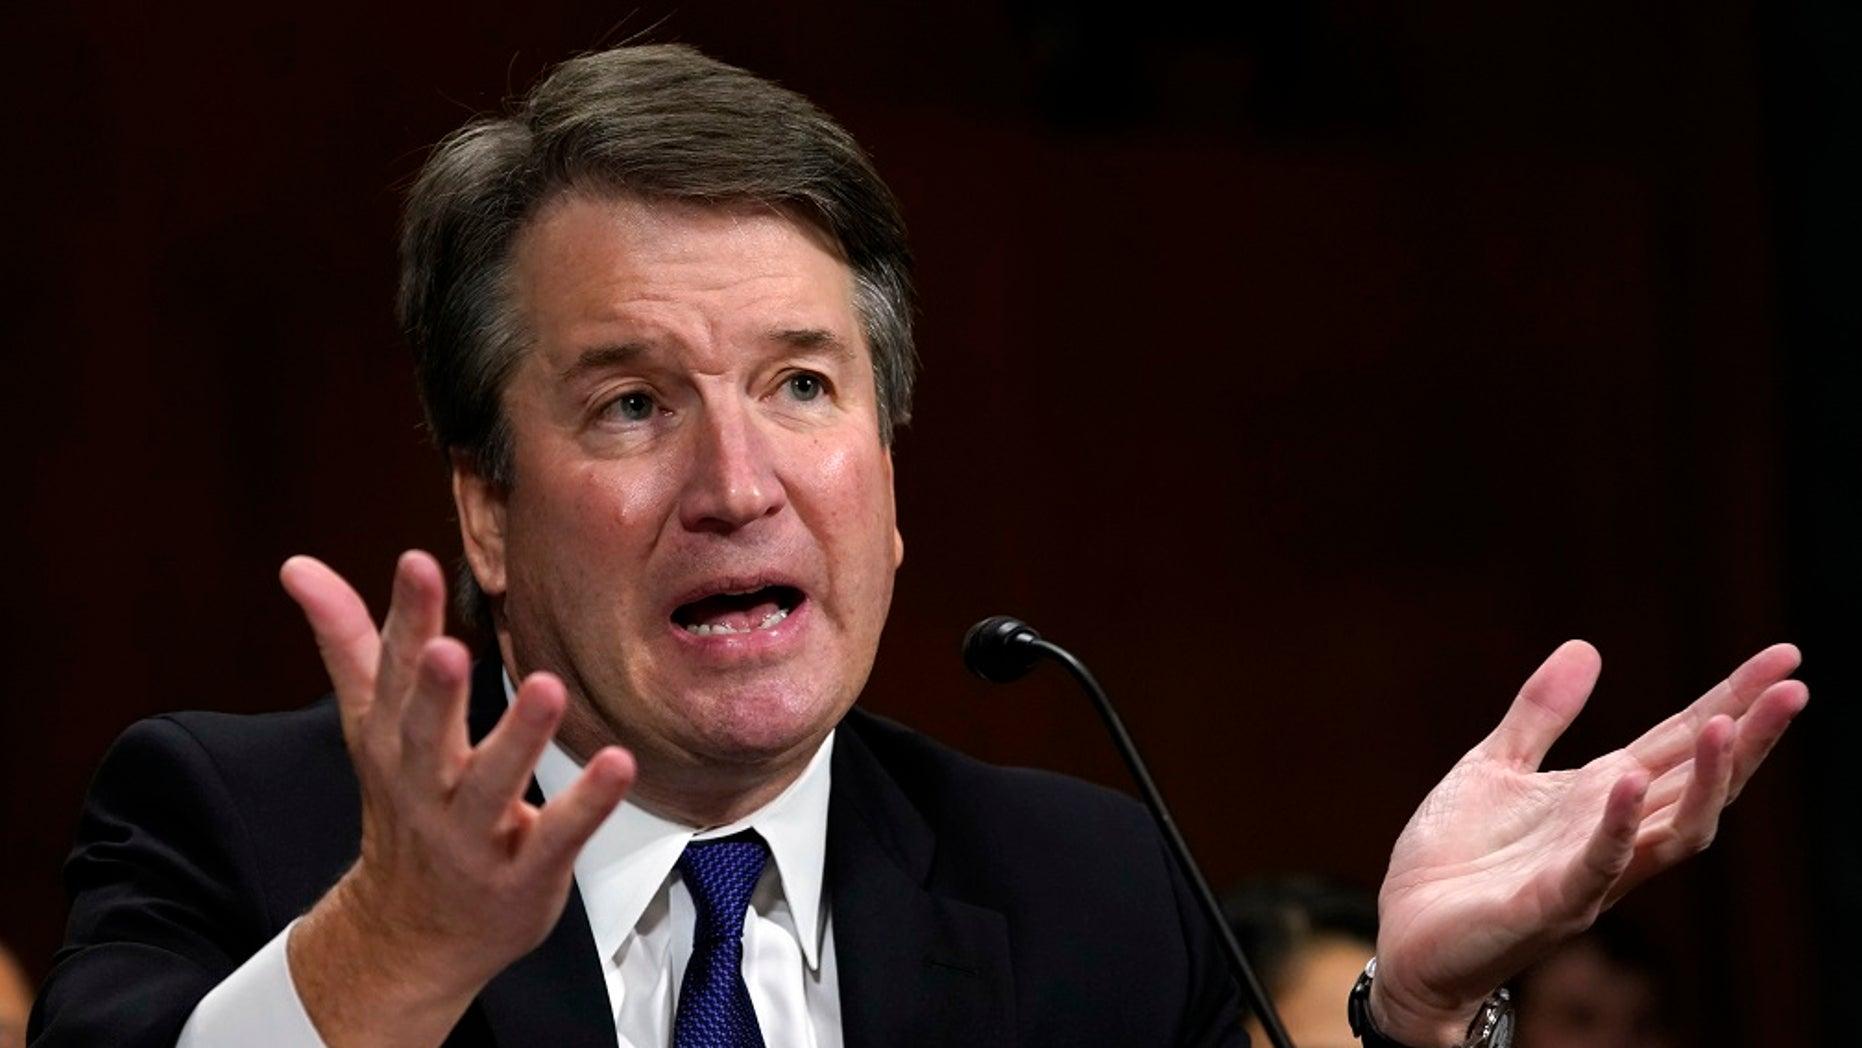 FILE - The Supreme Court nominee Judge Brett Kavanaugh testifies before the Senate Judiciary Committee on Capitol Hill in Washington.